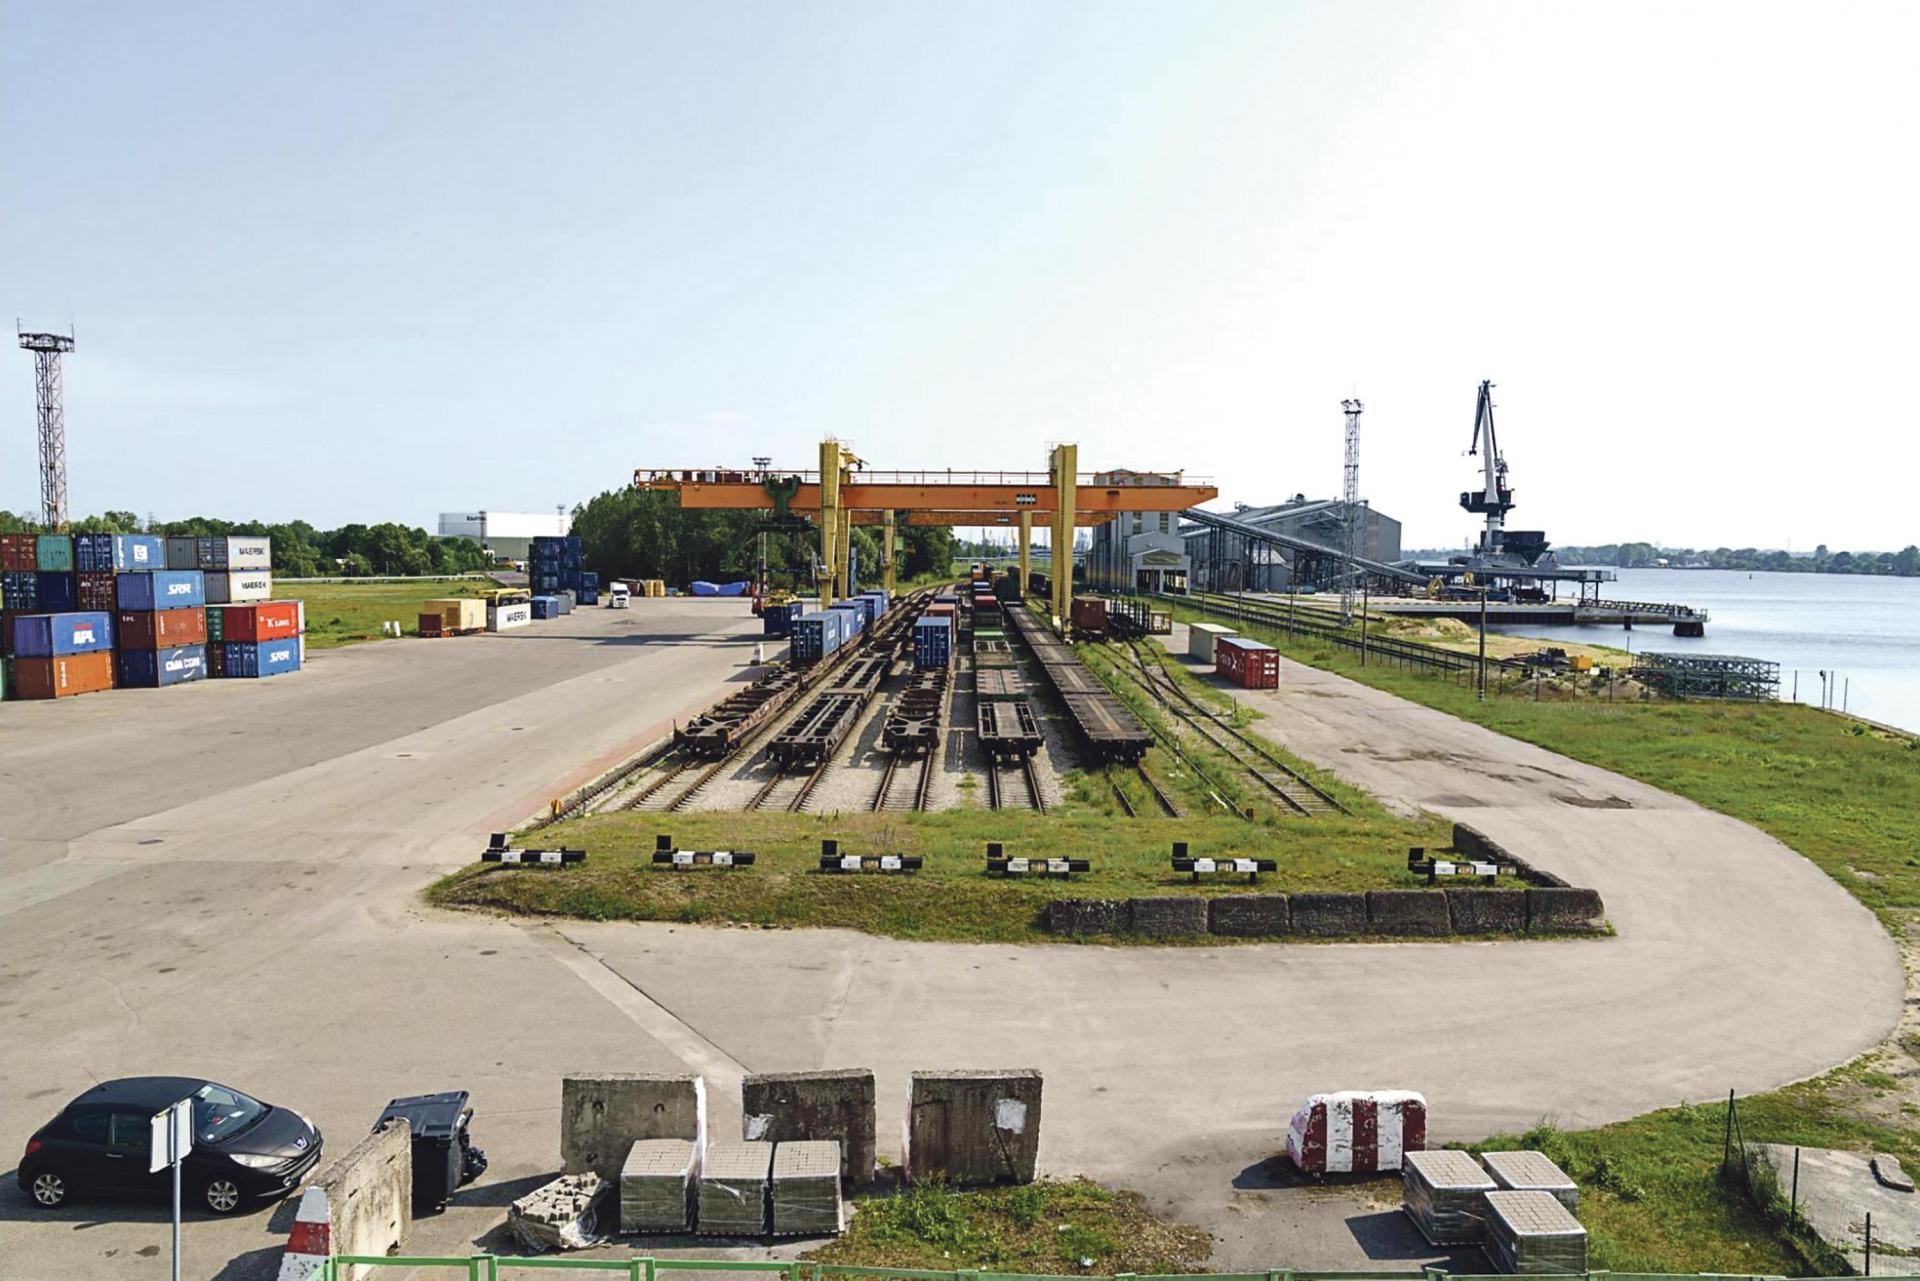 baltic container terminal hili mariner